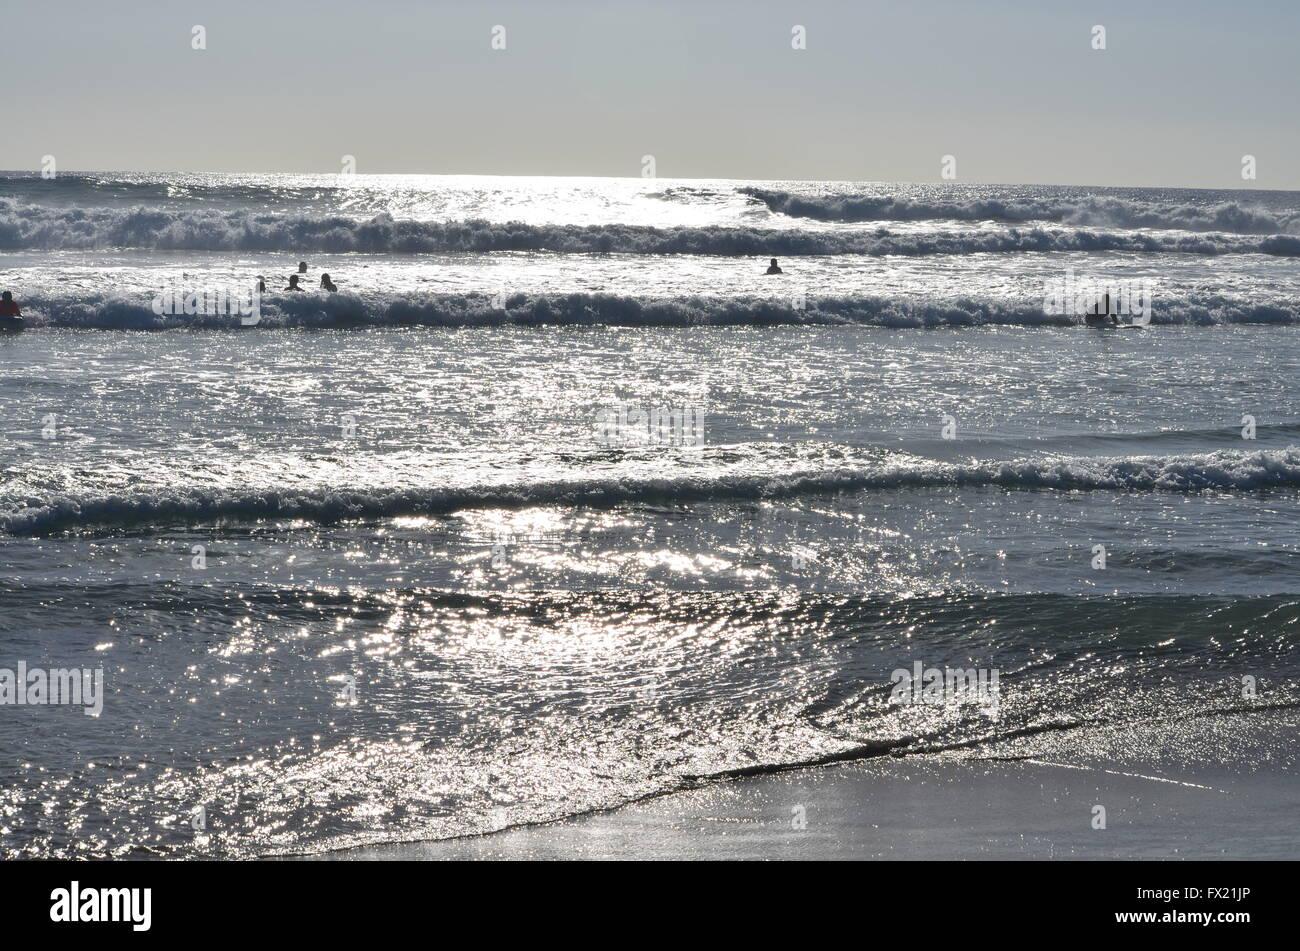 Shimmering Waves at Cerritos Beach Near Cabo San Lucas Mexico - Stock Image